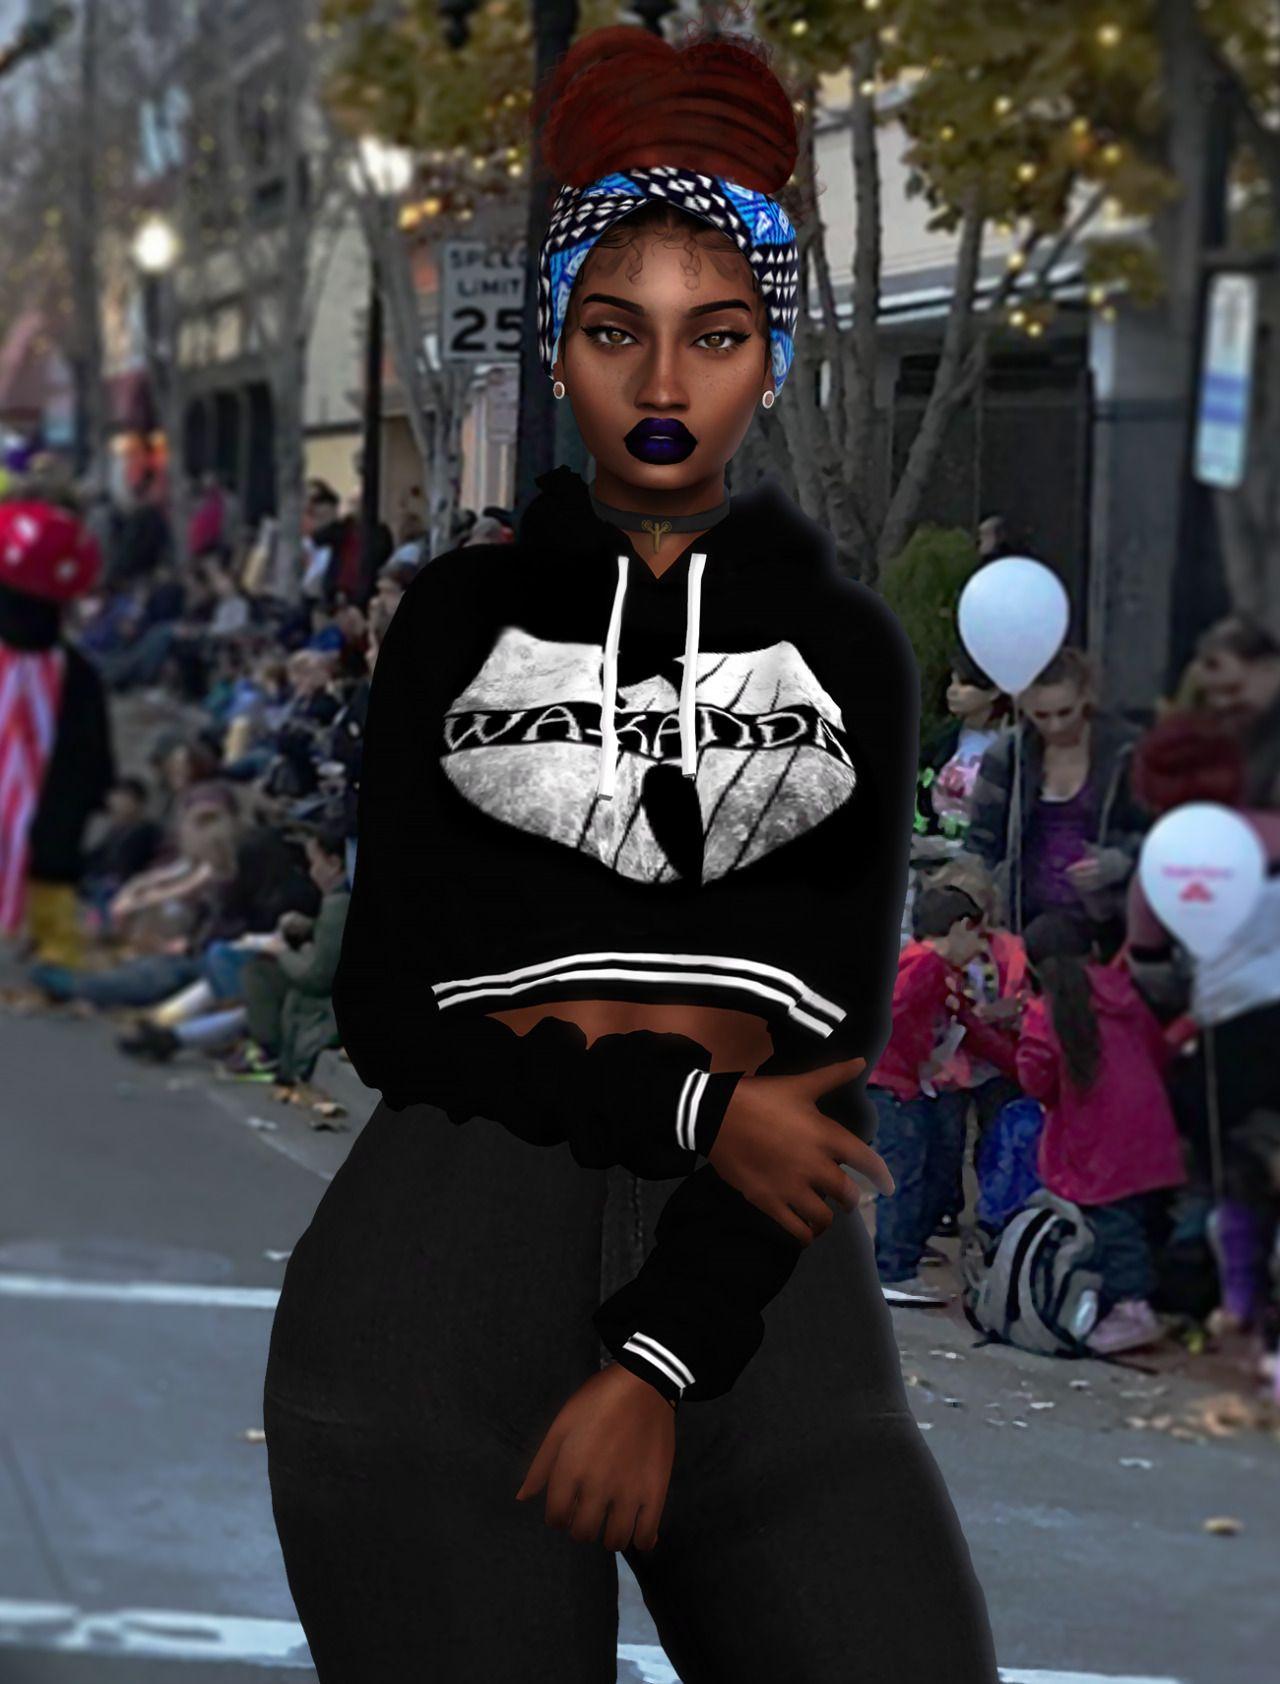 Proud Black Simmer   Sims 4 cc kids clothing, Sims 4